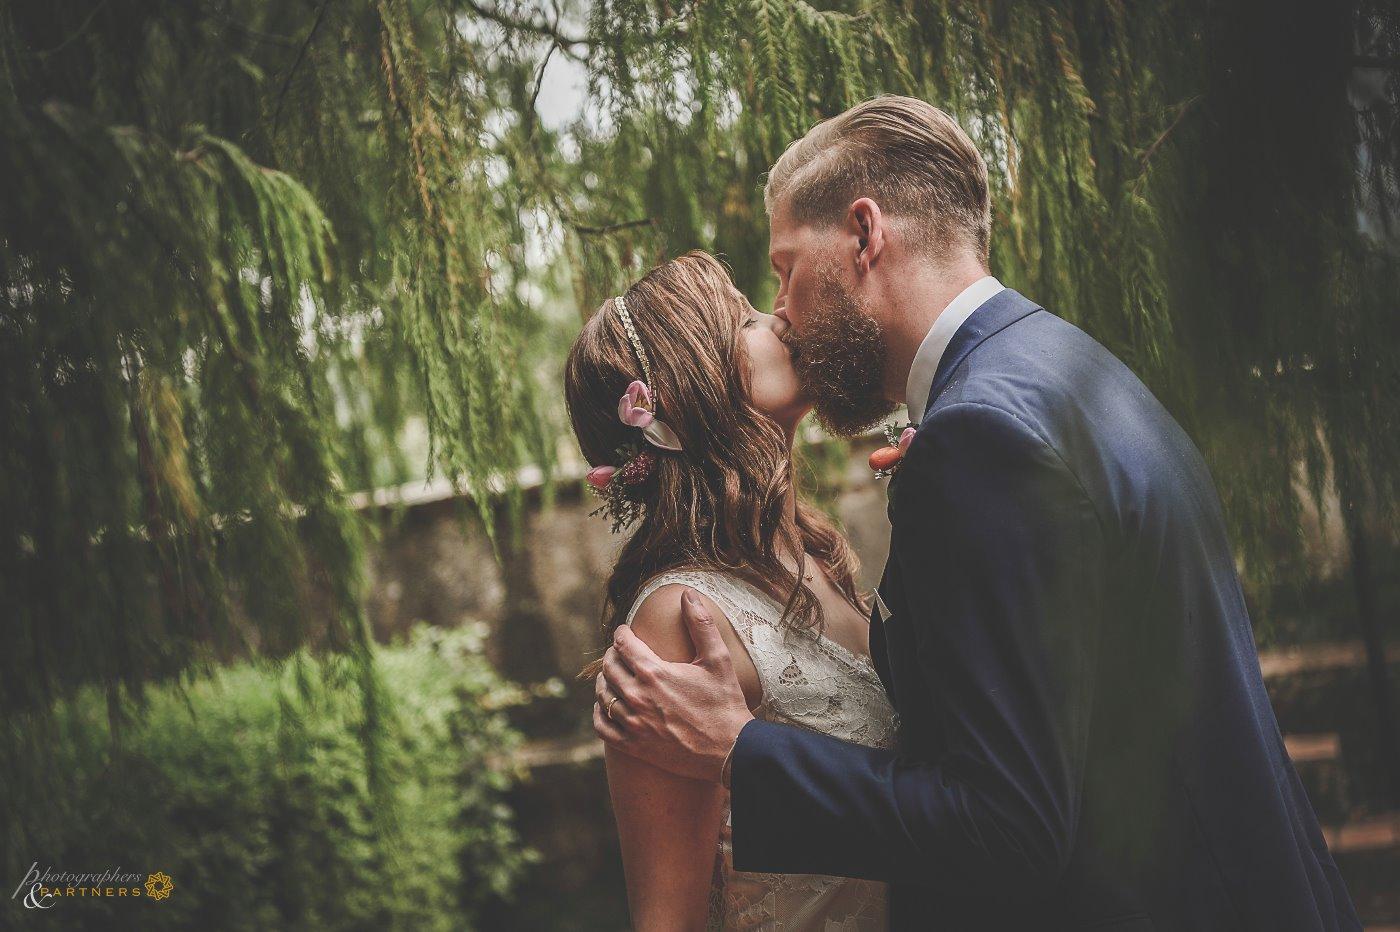 photos_weddings_castello_oliveto_18.jpg